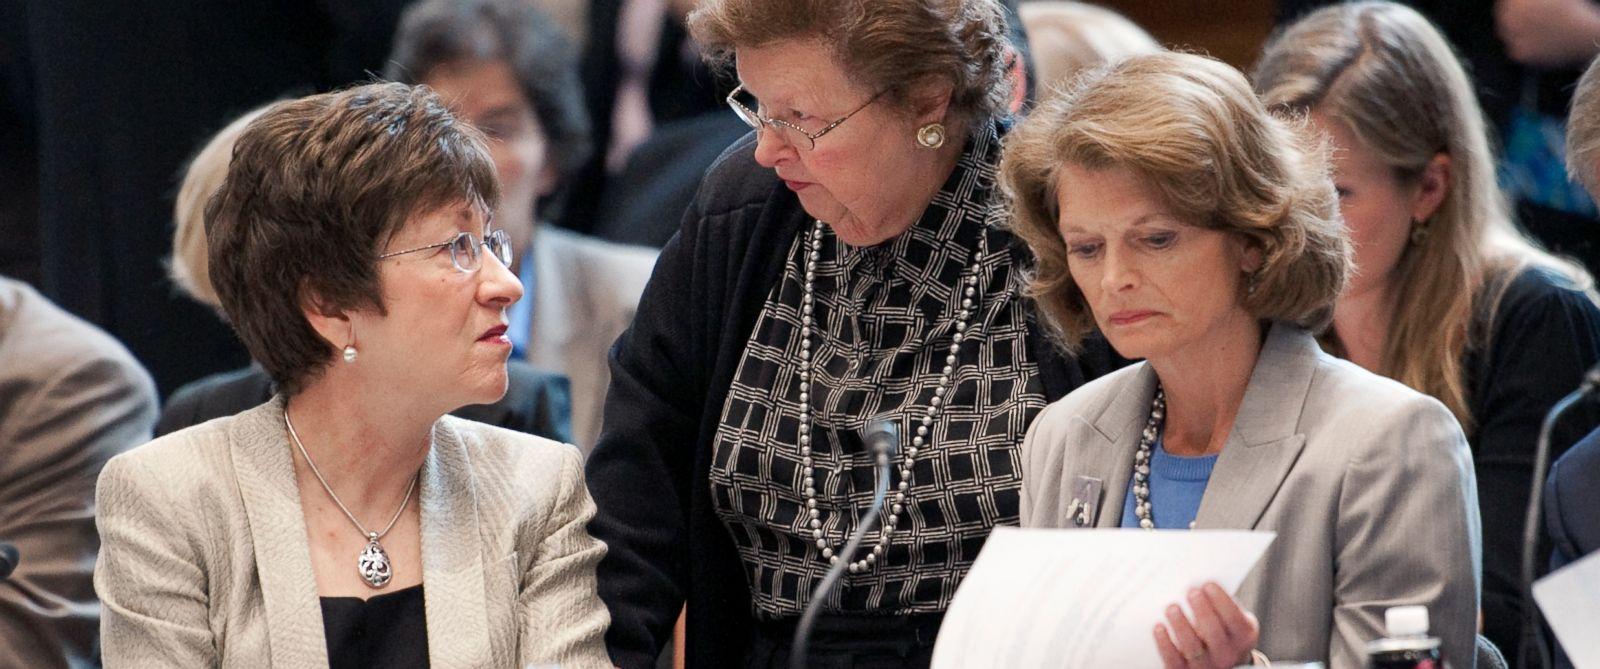 PHOTO: From left, Sen. Susan Collins, Sen. Barbara Mikulski, and Sen. Lisa Murkowski speak at a Senate Appropriations committee in Washington, April 26, 2012.